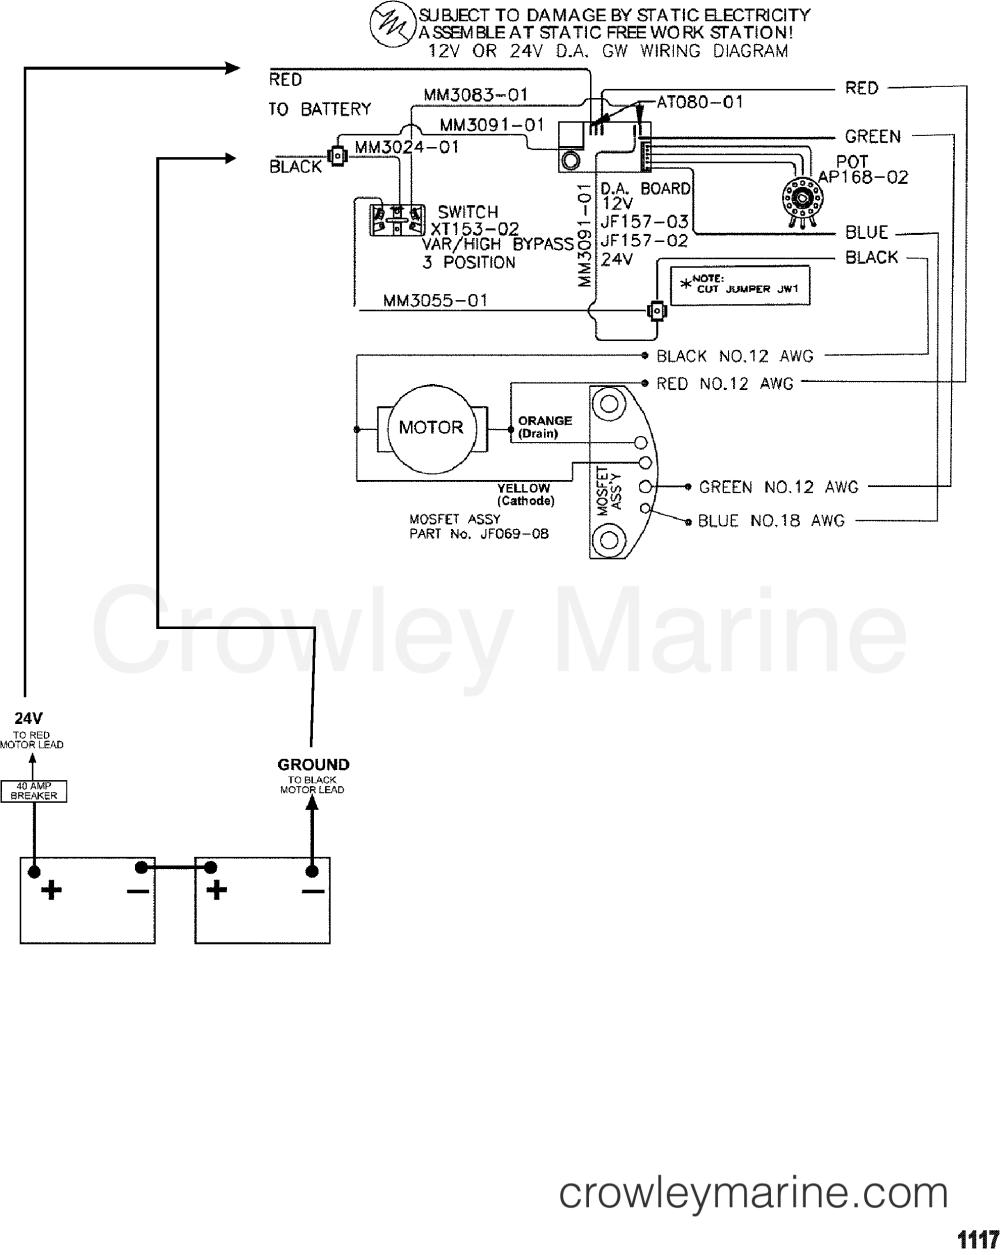 medium resolution of motorguide wiring diagram wiring diagram operations motorguide trolling motor wiring diagram motorguide wiring diagram